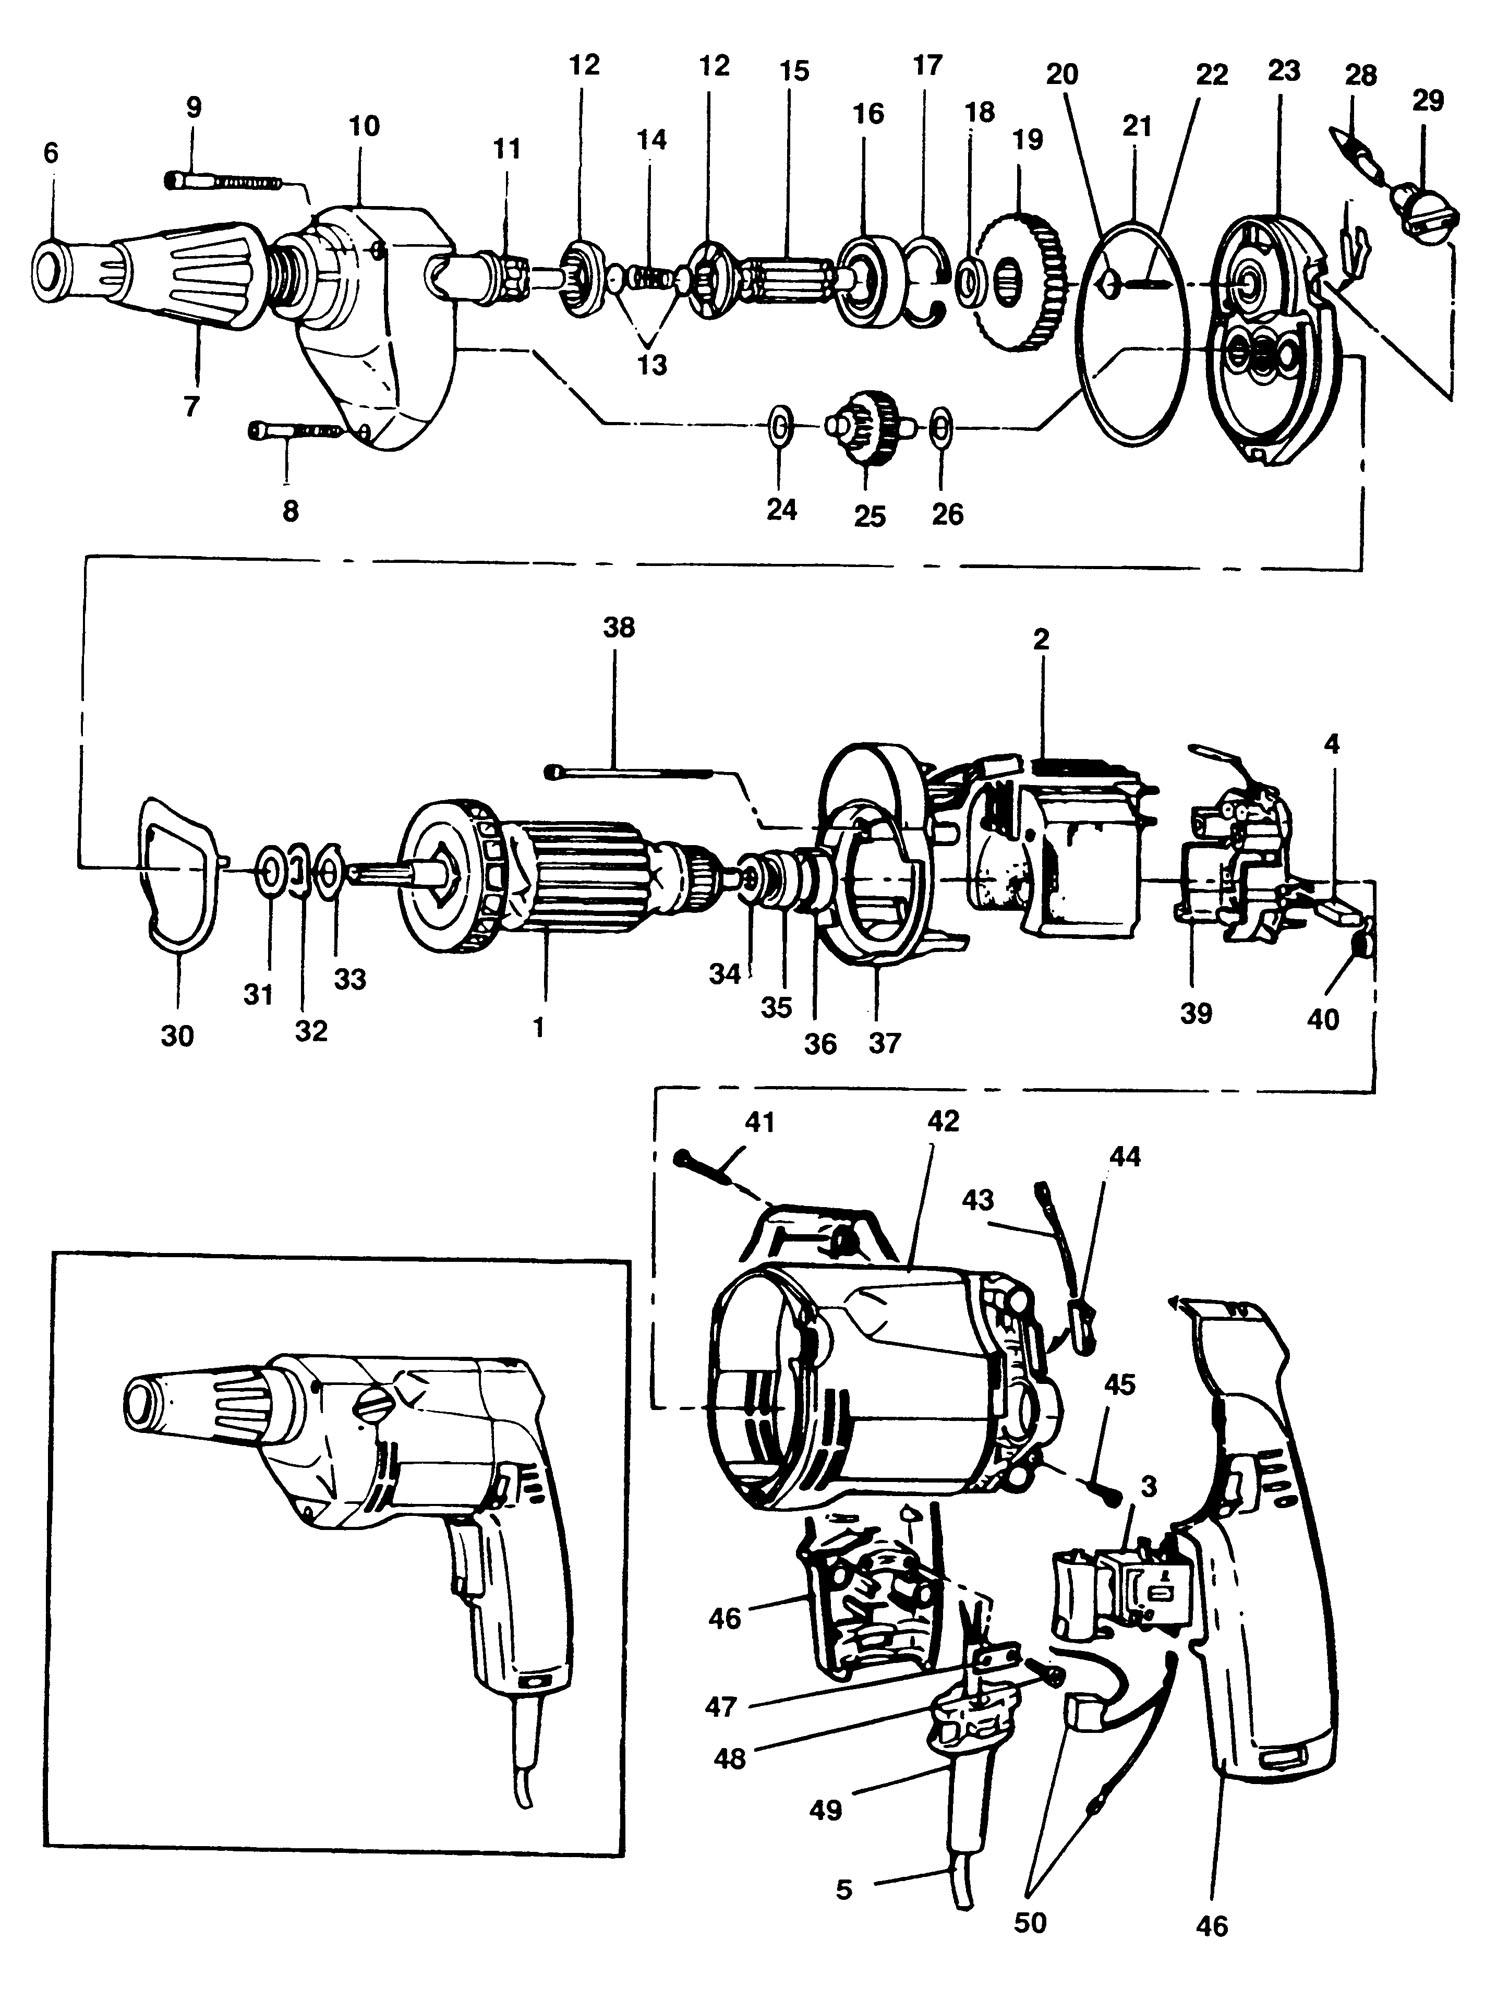 Spares For Elu Esd702 Screwdriver Type 1 Spare Esd702